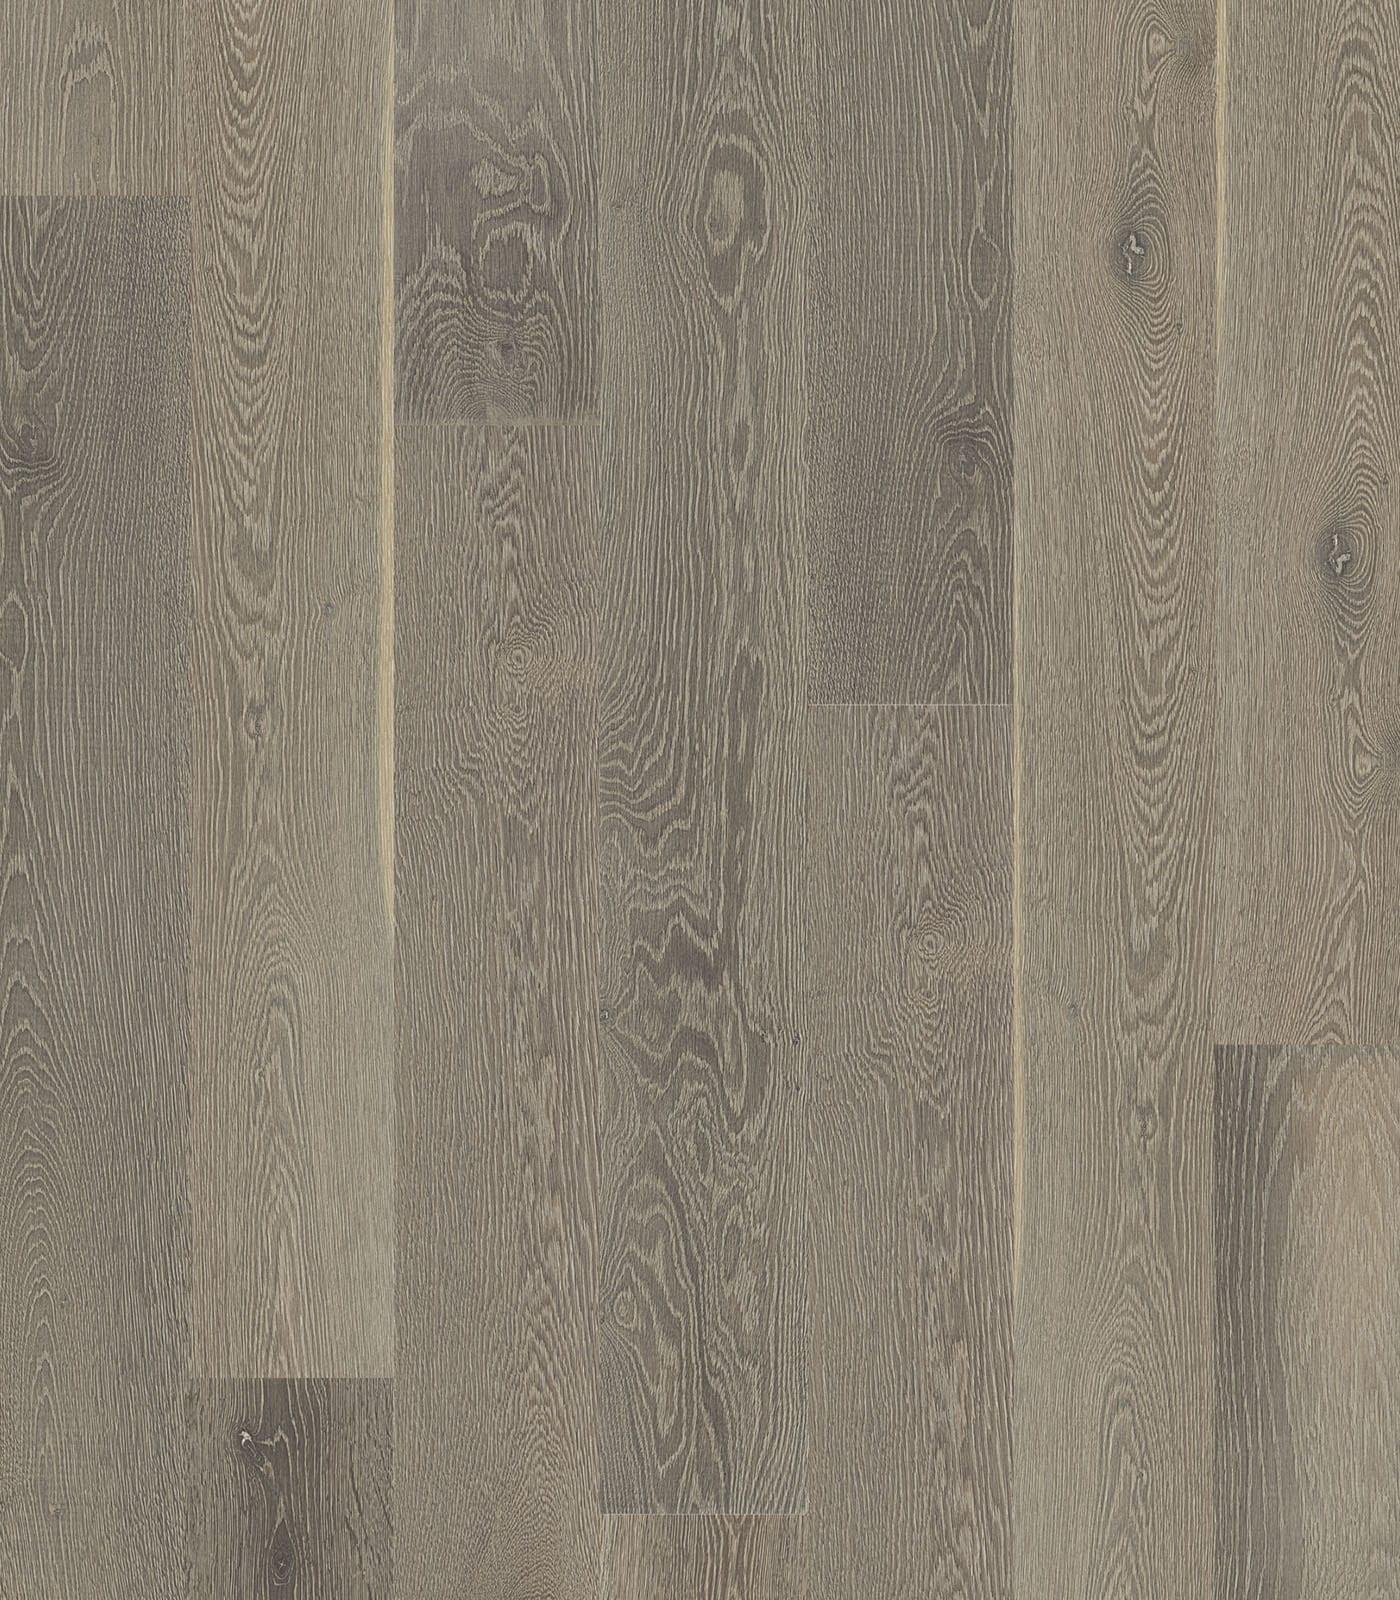 Lafite-Colors Collection-European Oak floors-flat